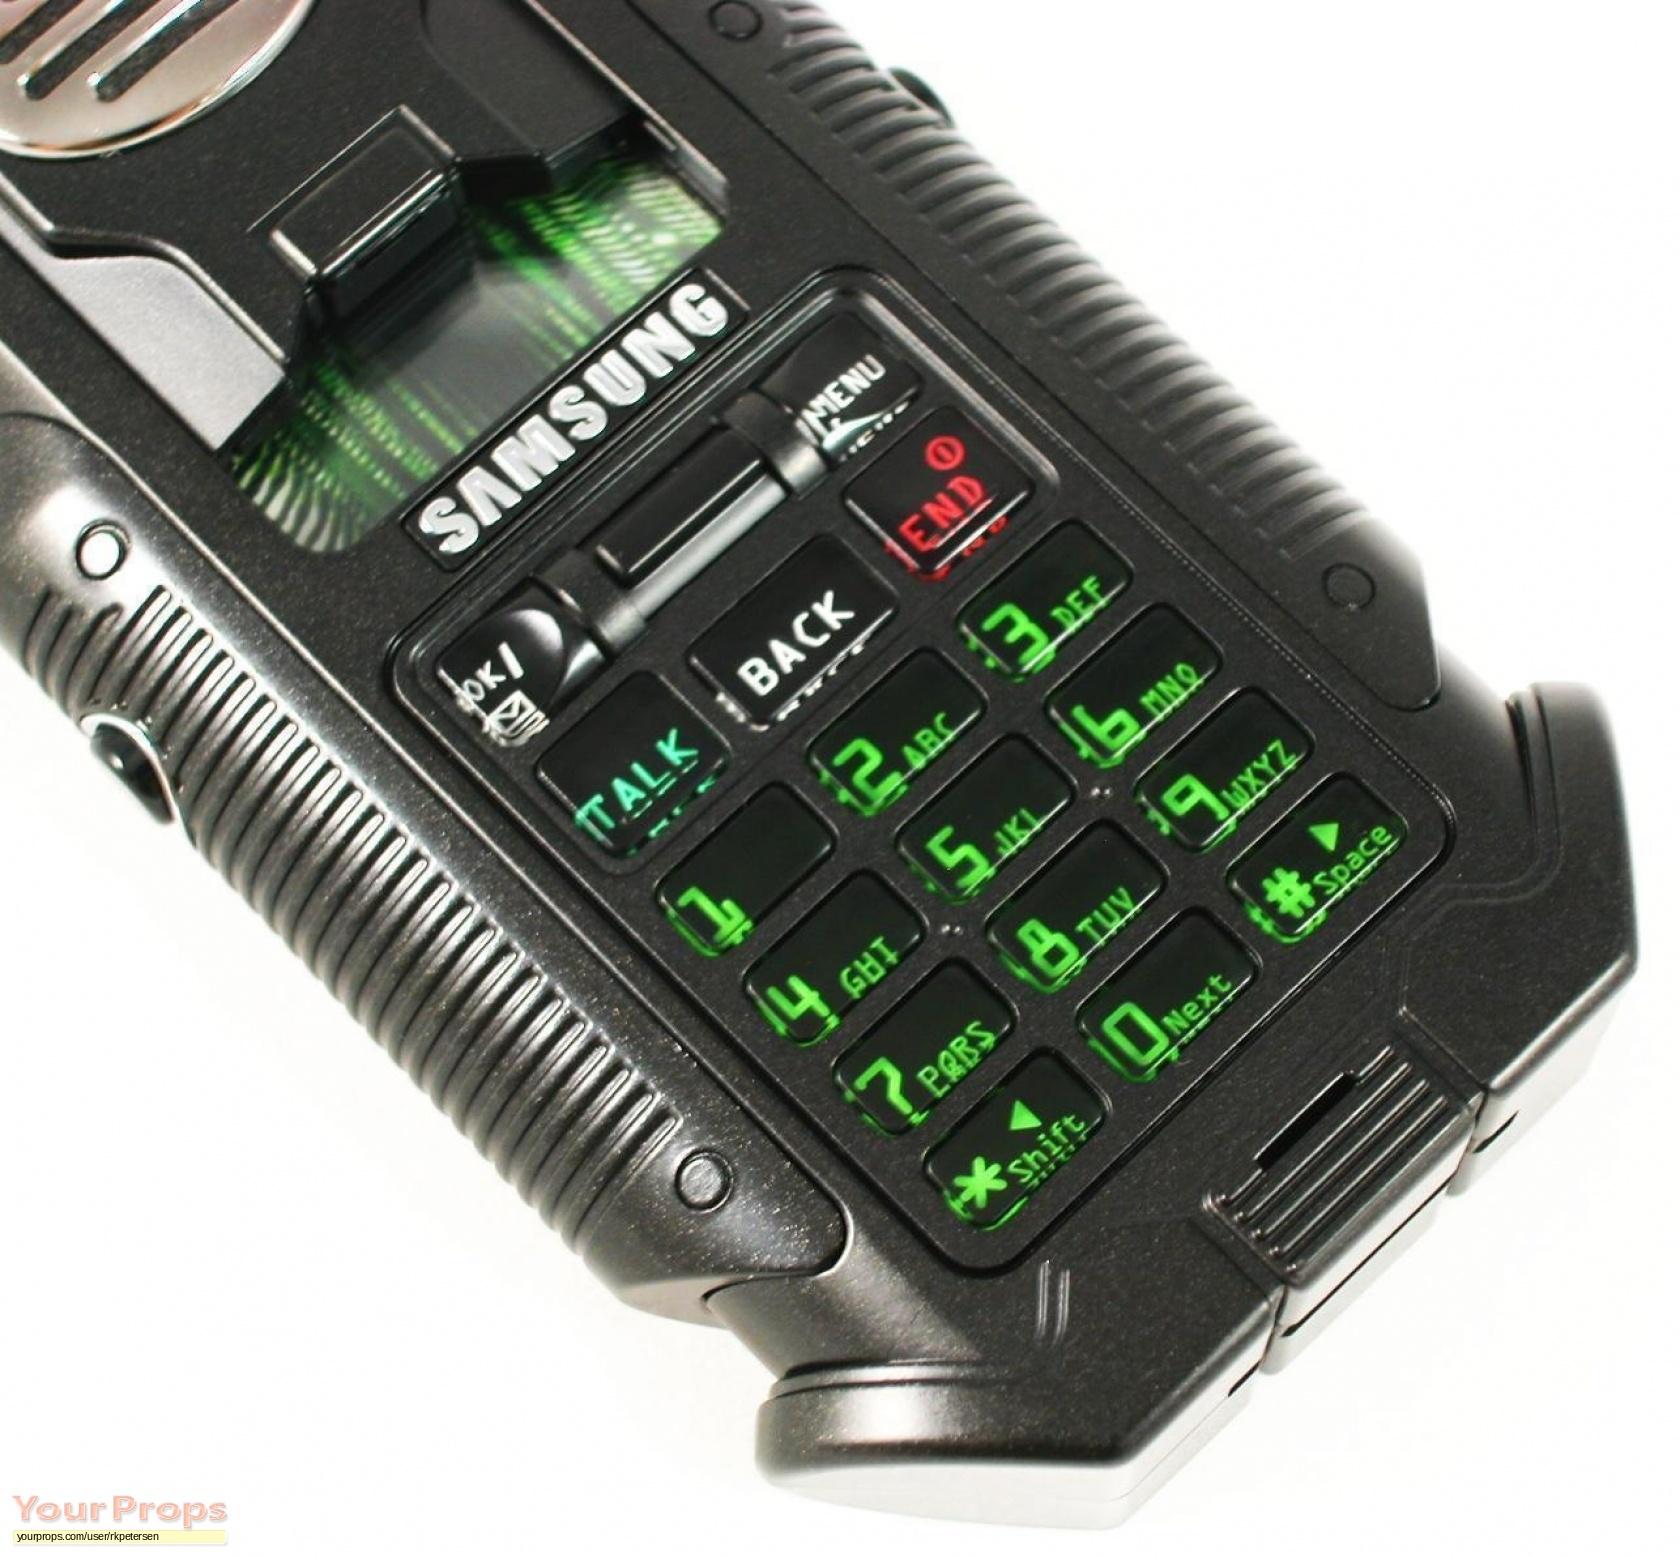 yp phone